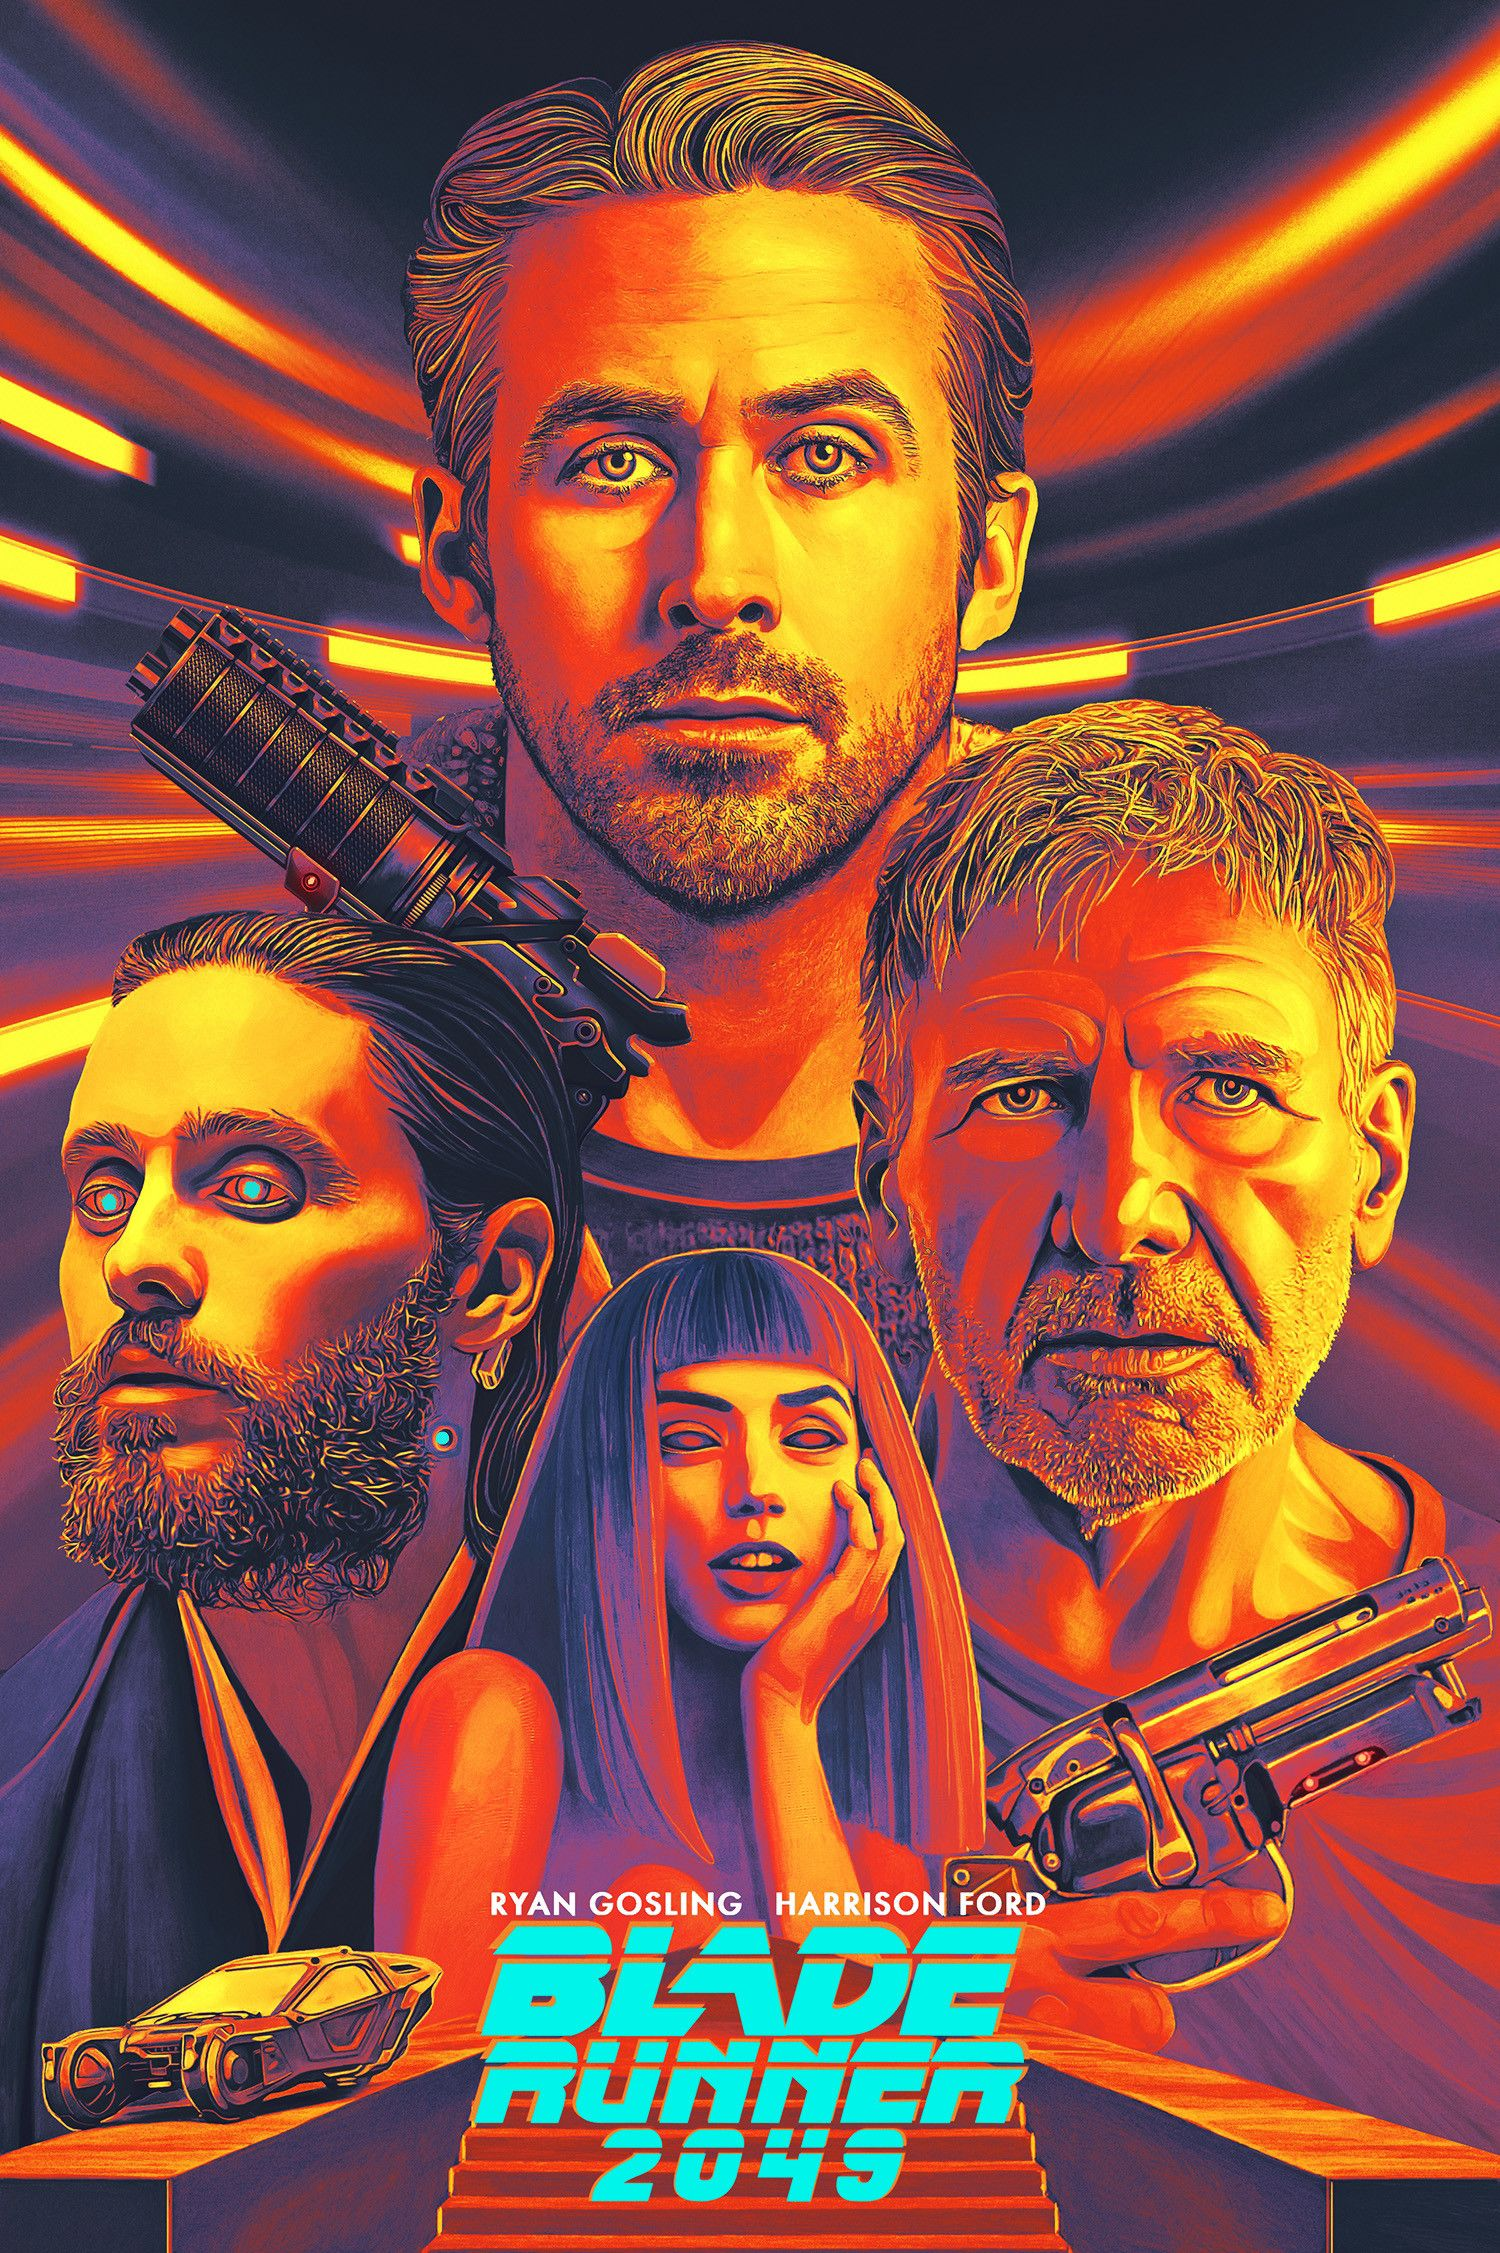 Alternative Blade Runner 2049 Illustration By Nicky Barkla Blade Runner Poster Blade Runner Blade Runner 2049